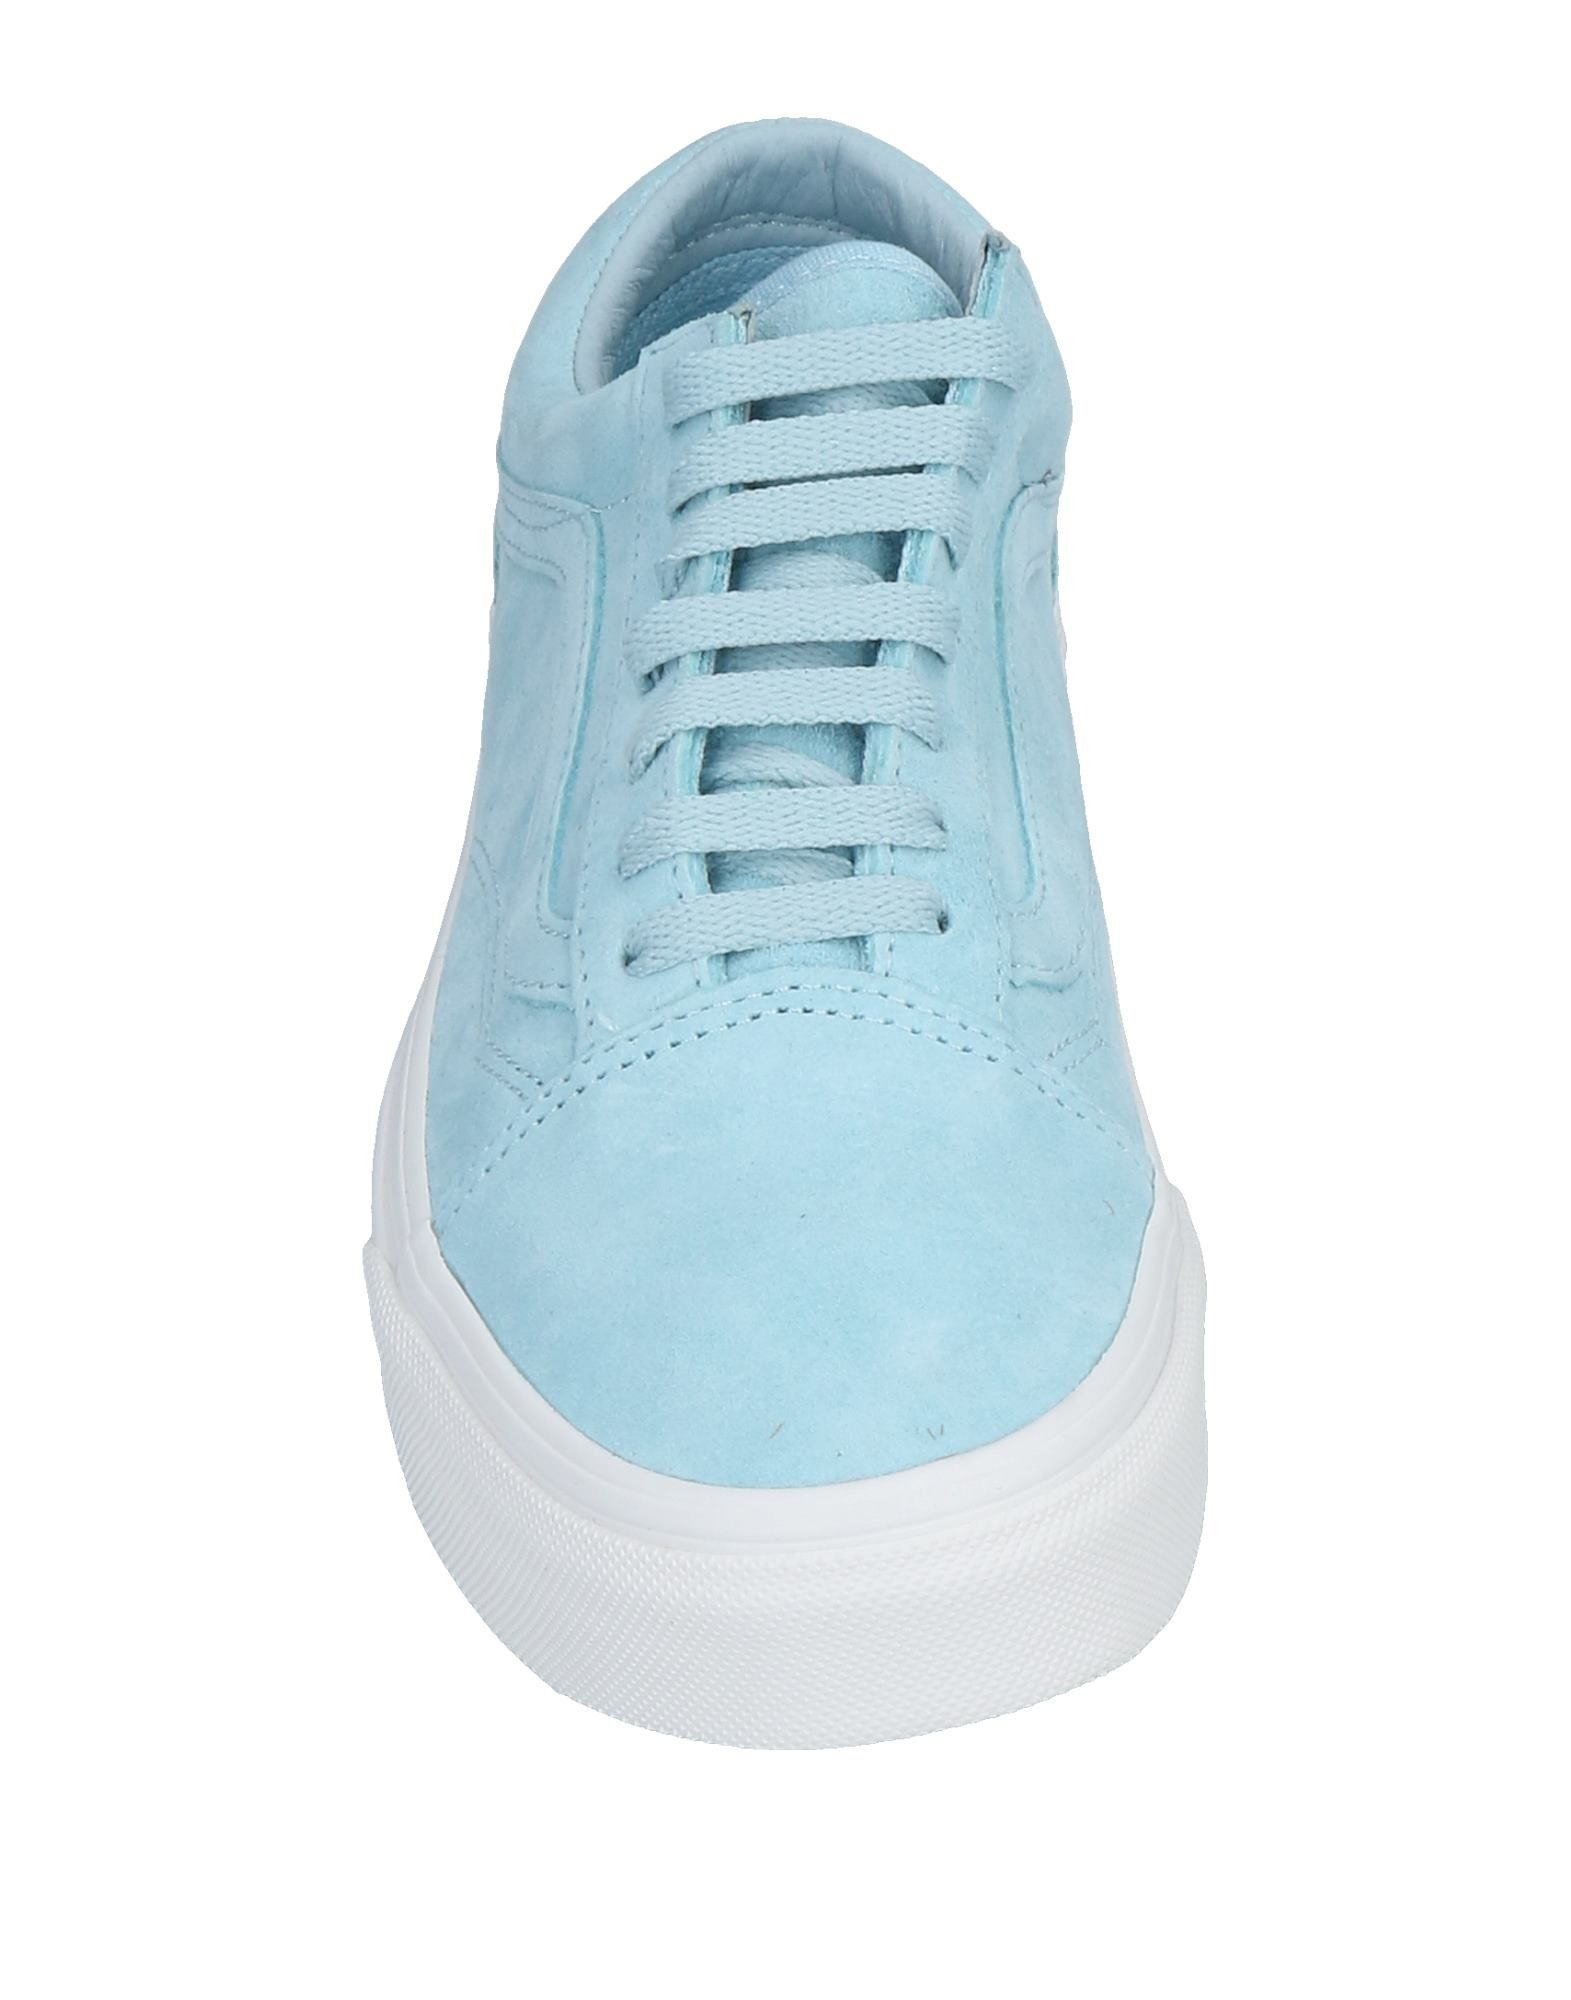 Vans 11484191FQ Turnschuhes Damen 11484191FQ Vans Gute Qualität beliebte Schuhe 26f8c1